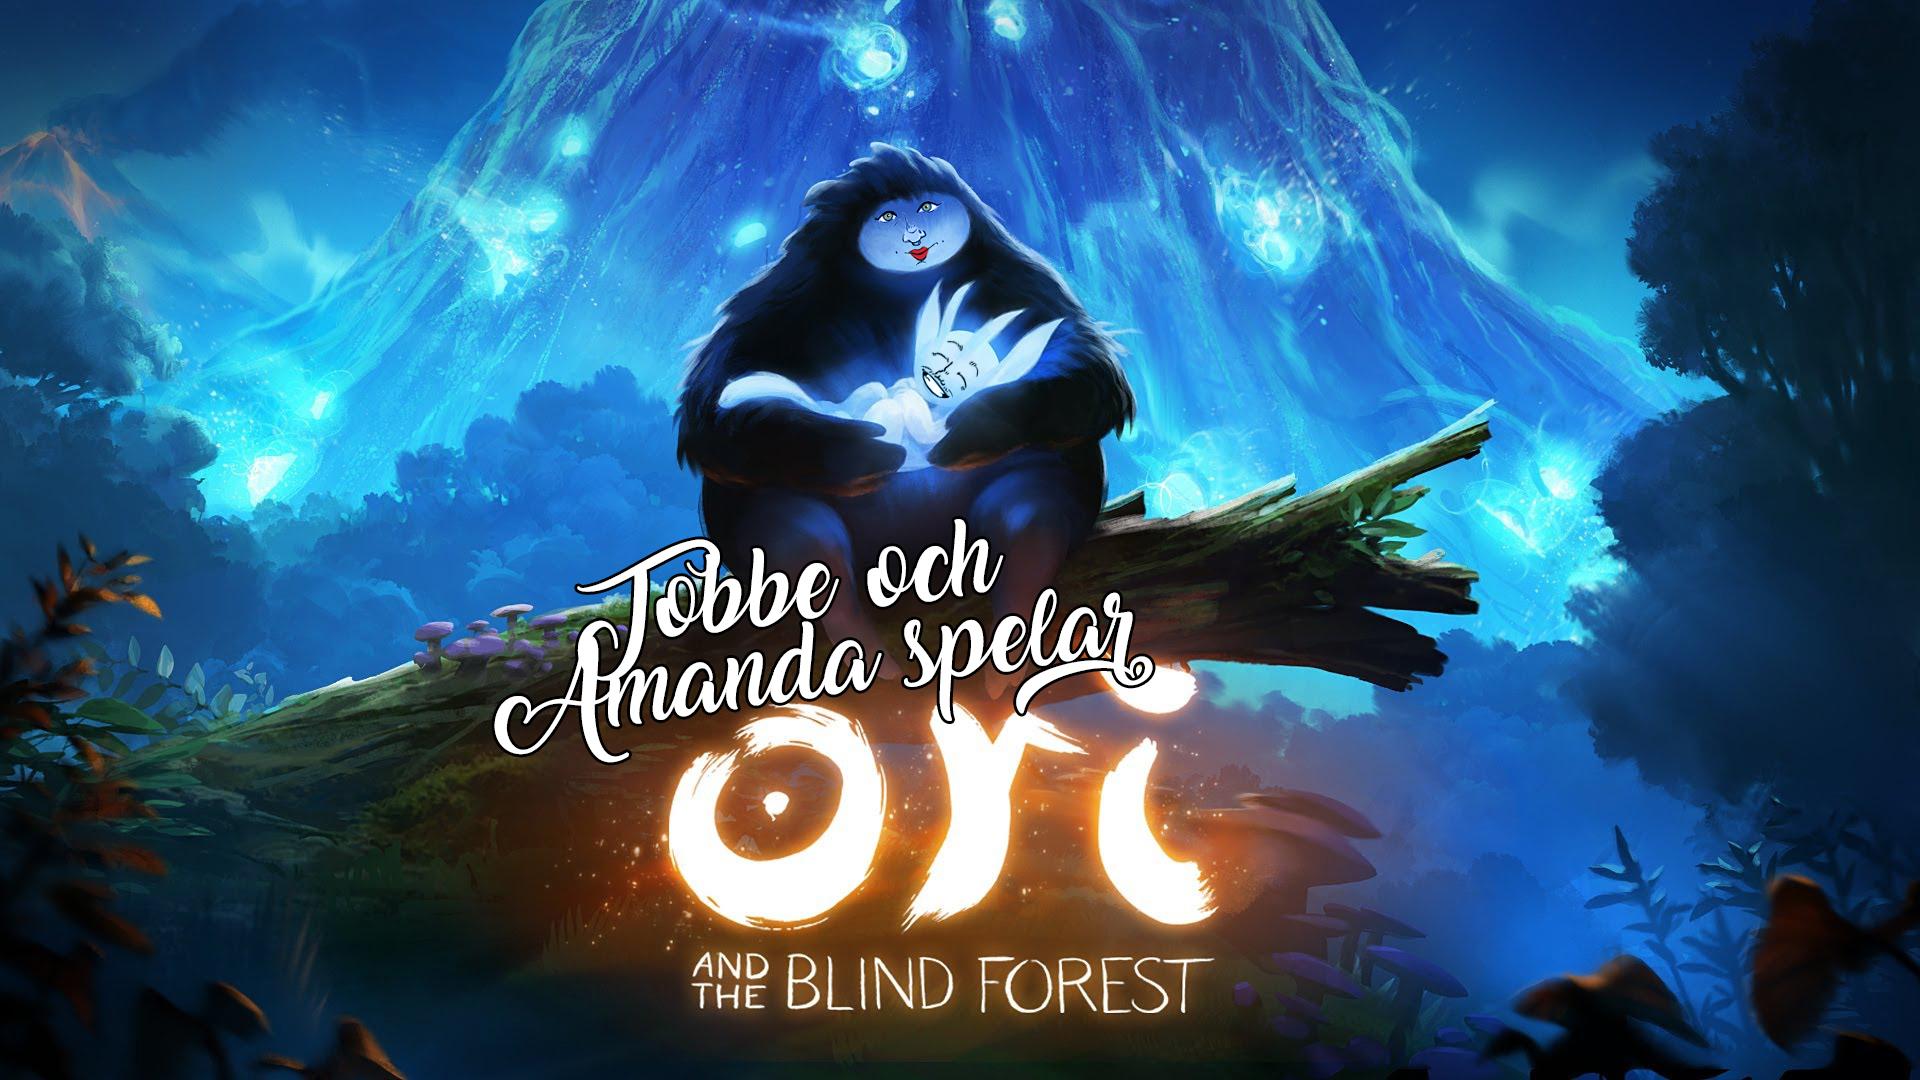 Tobbe och Amanda spelar Ori and the Blind Forest